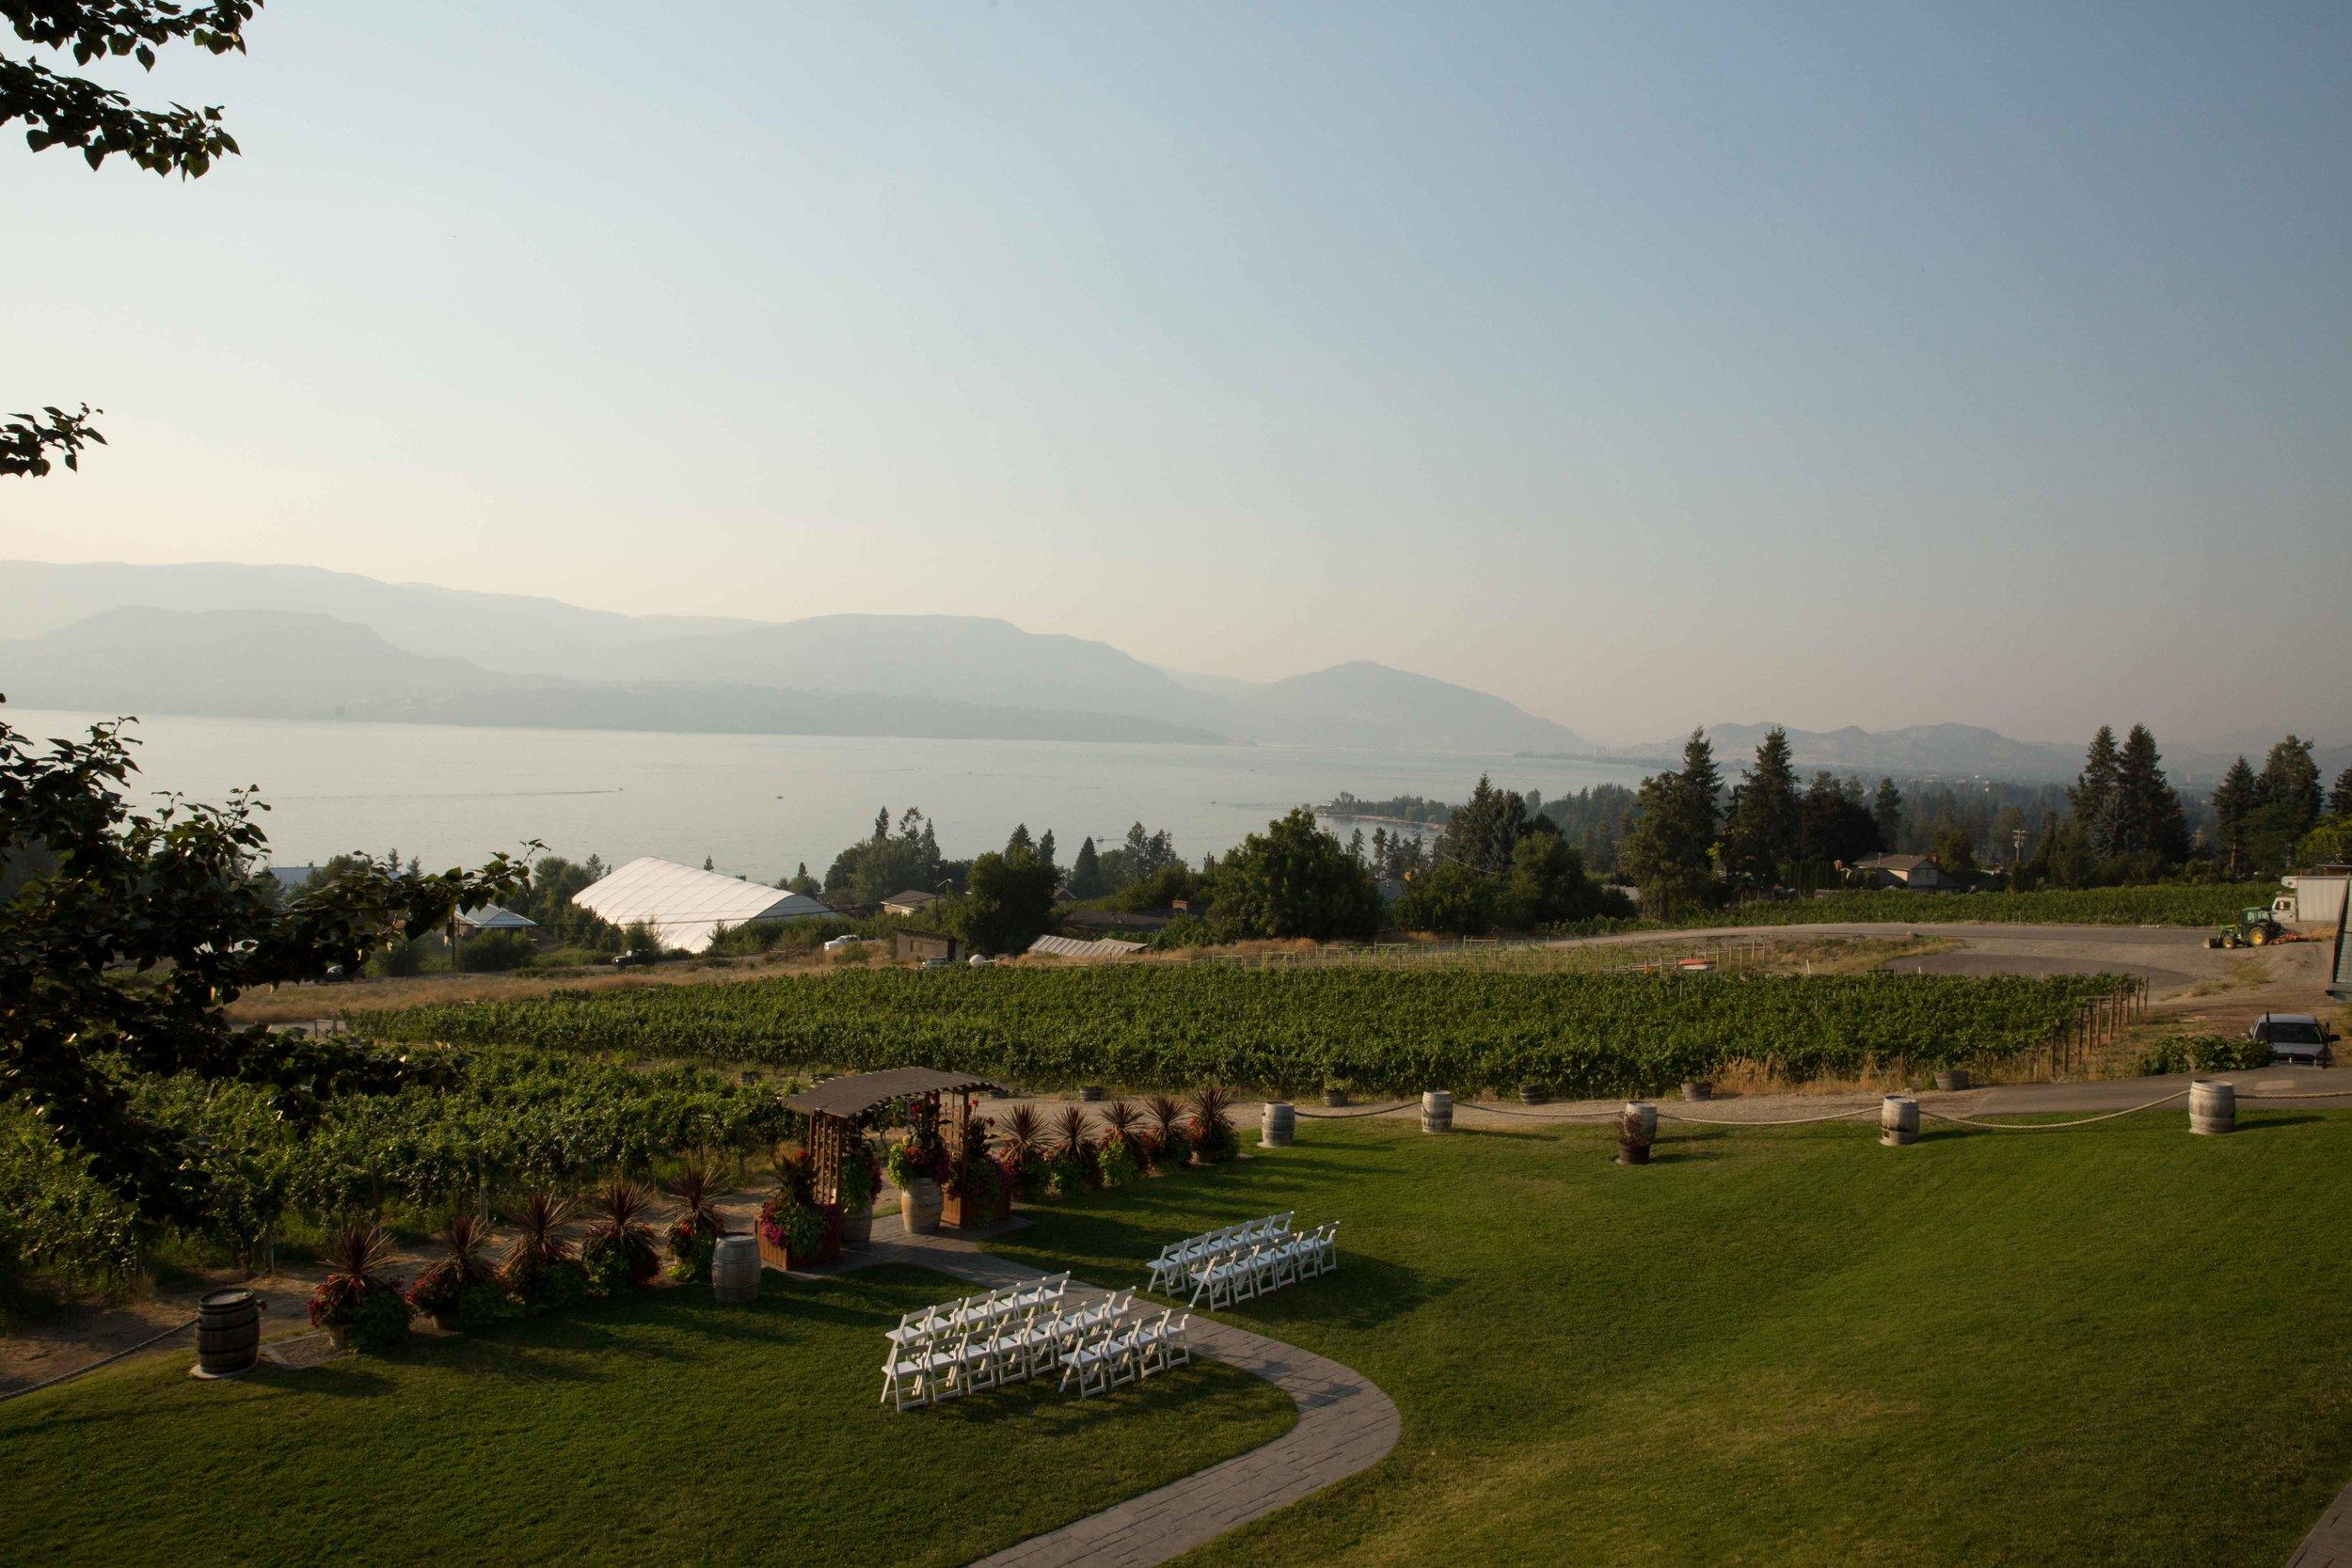 Summerhill wedding reception in Kelowna British Columbia.